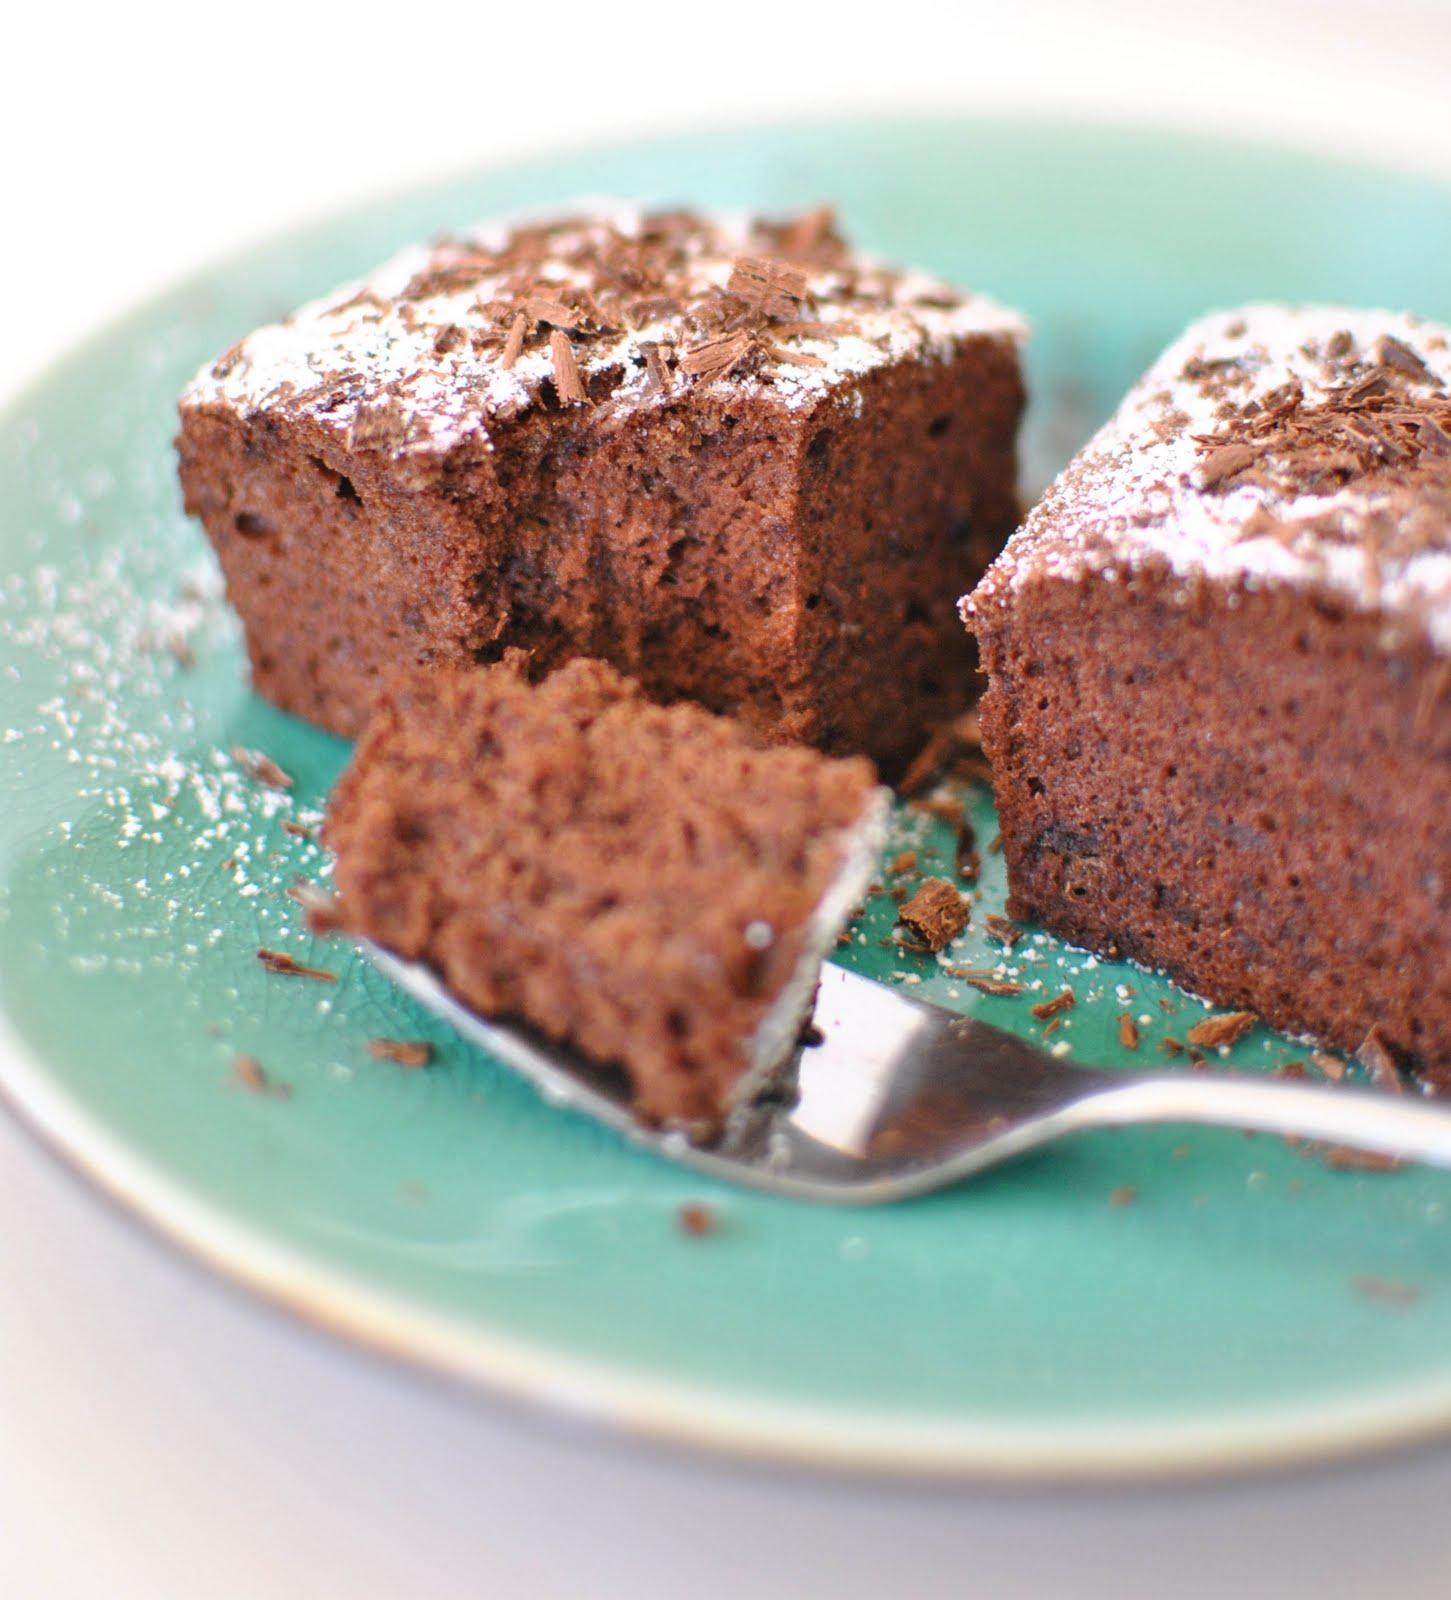 Scandi Home: Tetsuya's Flourless Chocolate Cake